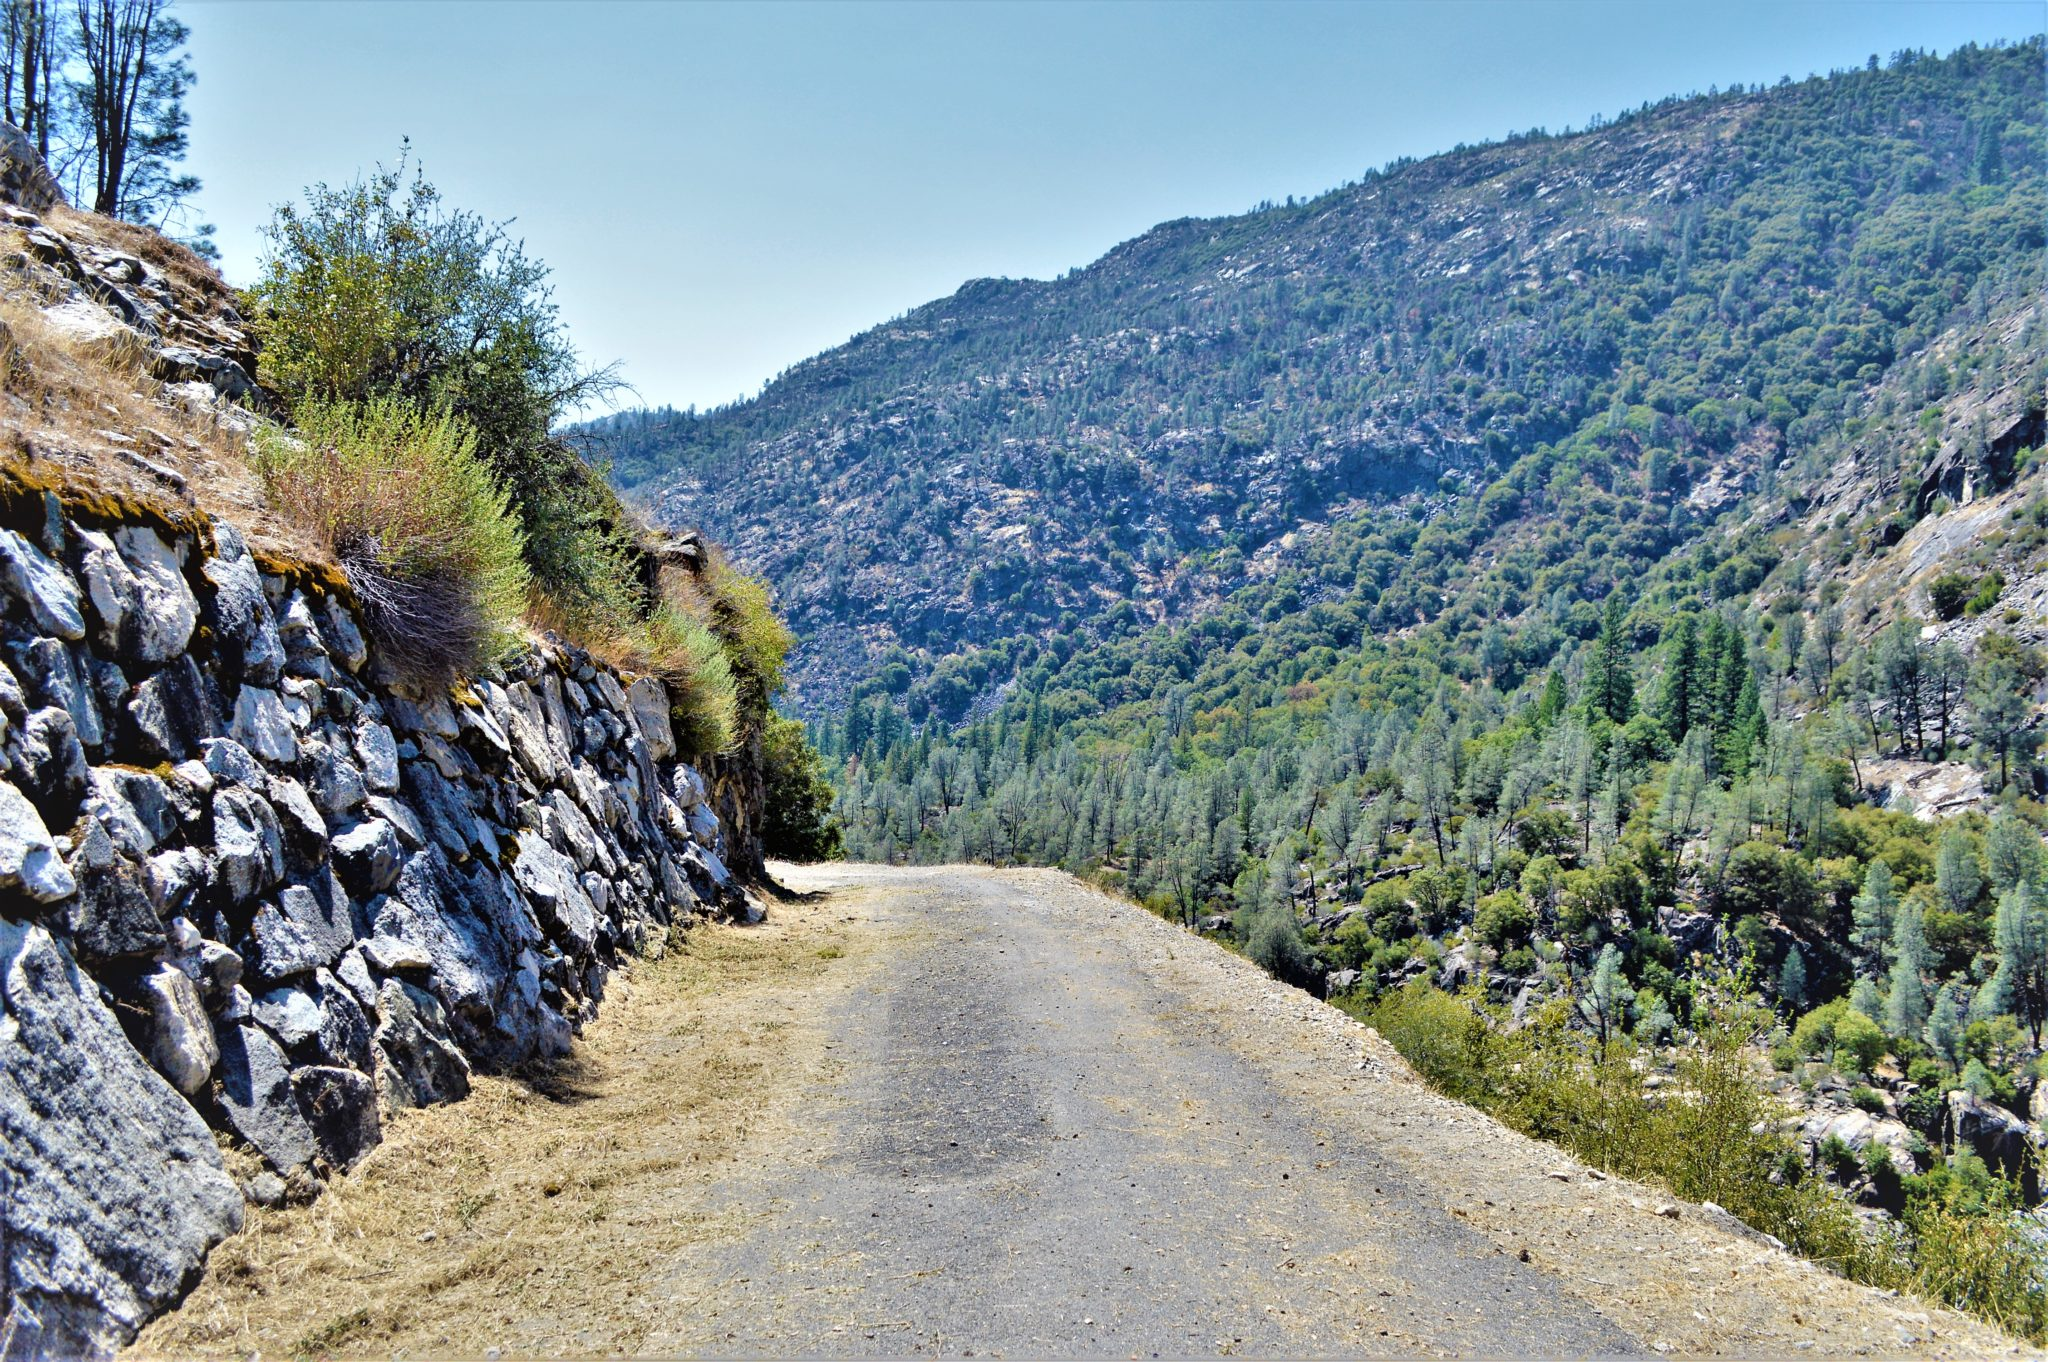 Hiking path, Hetch Hetchy, California